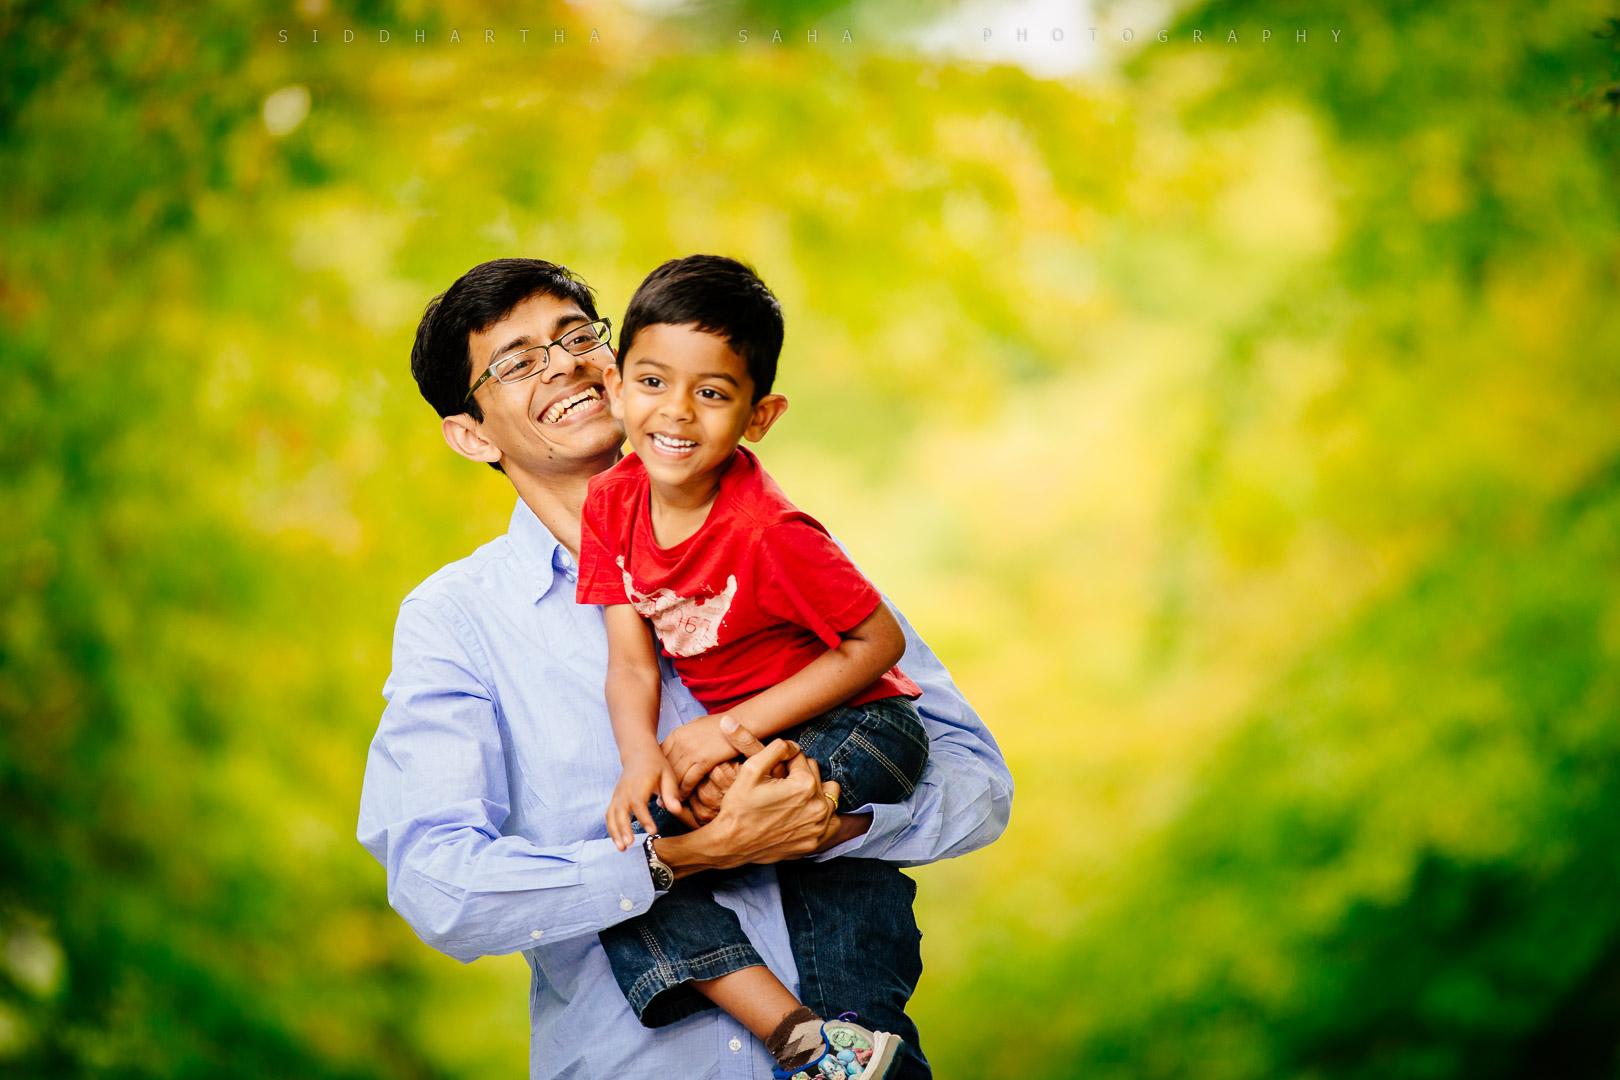 2015-08-08 - Padmaja Ketan Family Photoshoot - _05Y8846